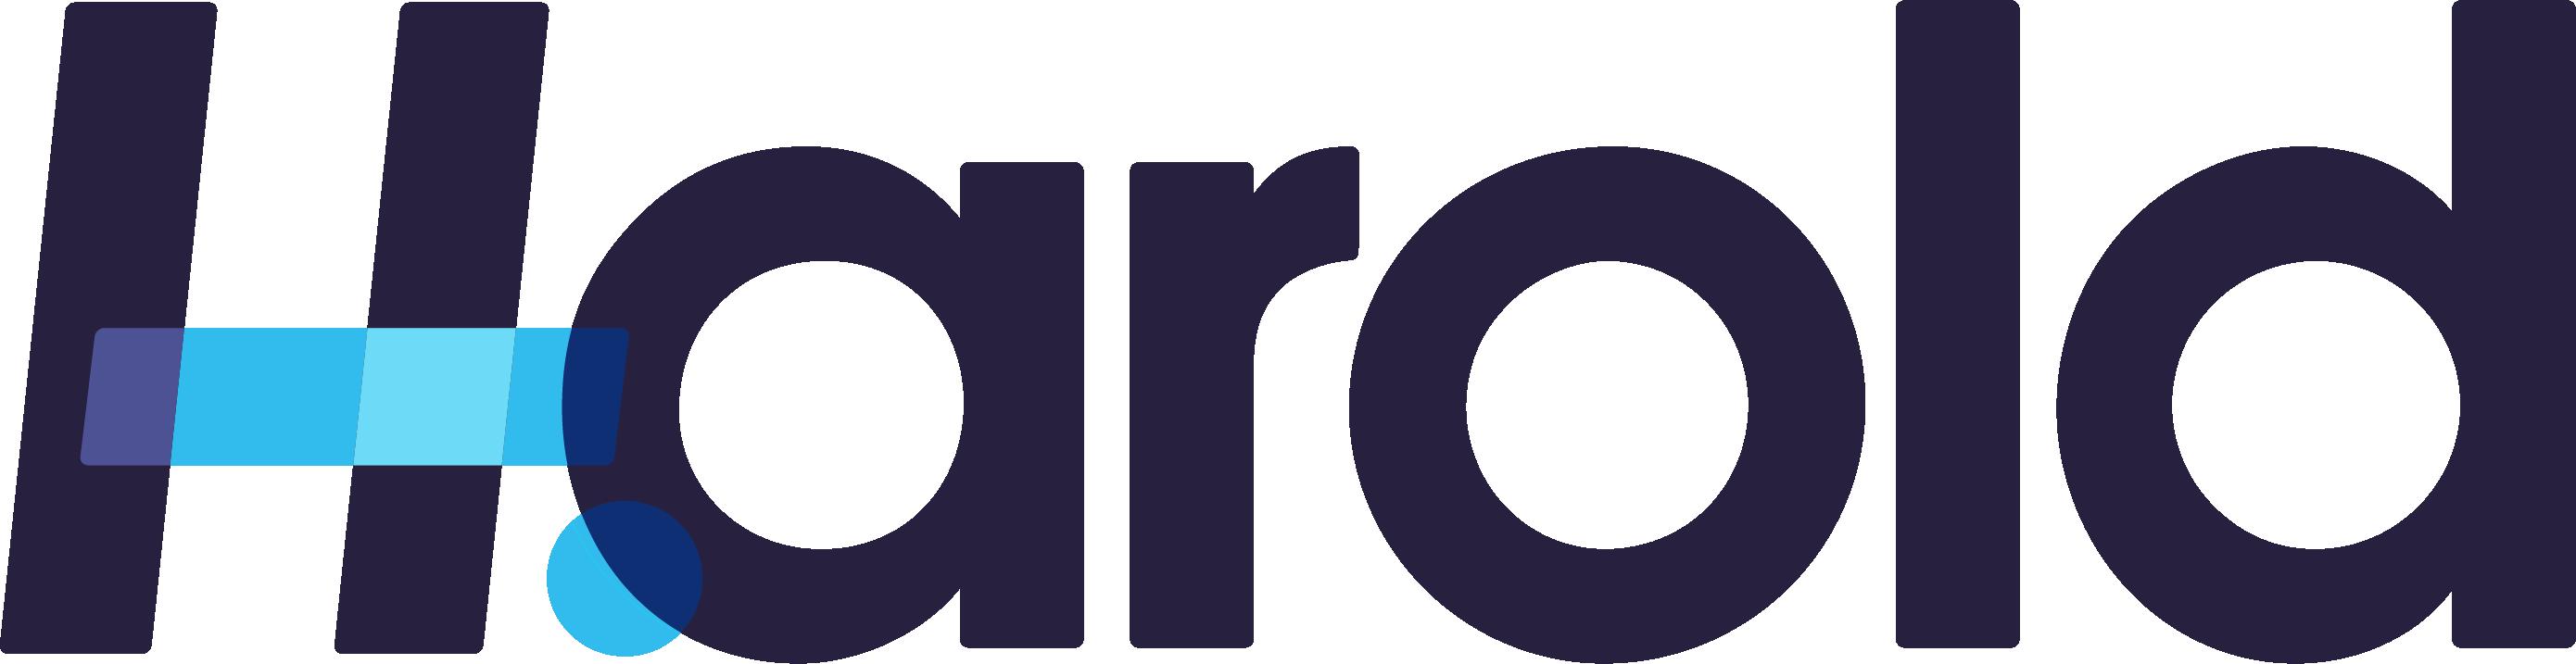 Harold logo harold